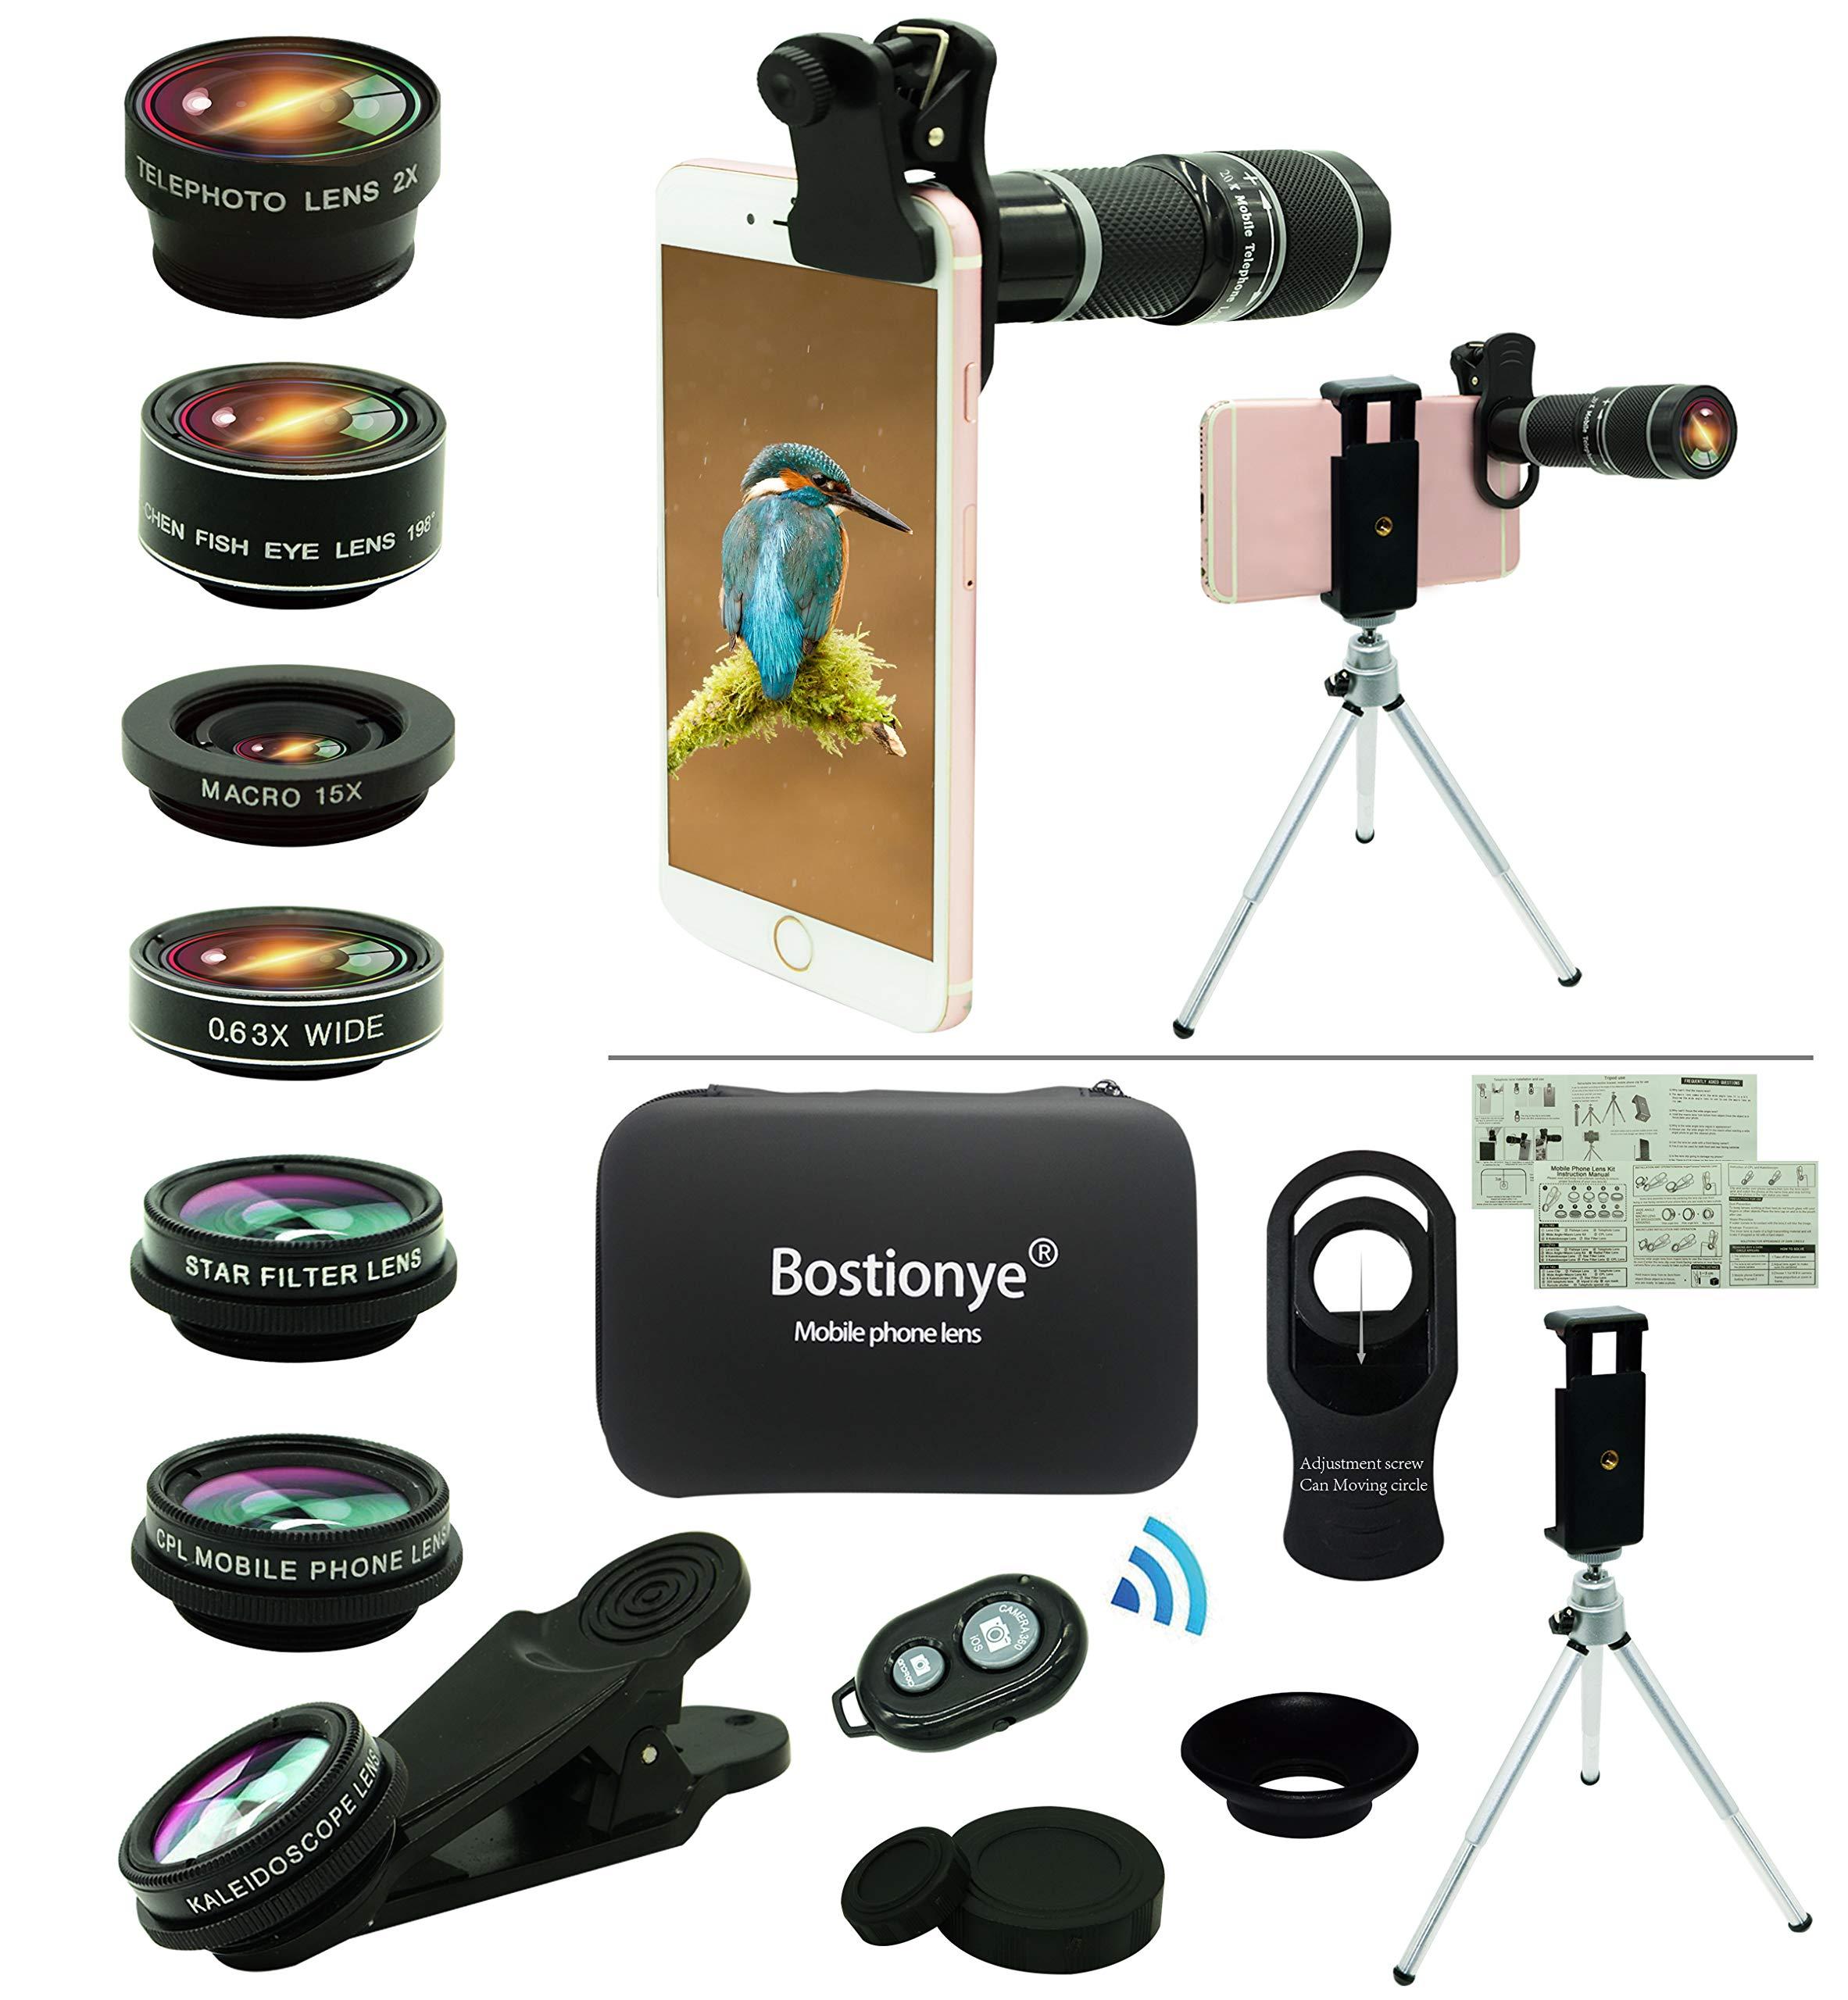 Cell Phone Camera Lens Kit,11 in 1 Universal 20x Zoom Telephoto Lens,0.63Wide Angle+15X Macro+198°Fisheye+2X Telephoto+Kaleidoscope+CPL/Starlight/Eyemask/Tripod/Remote,for Most Smartphone (Black)